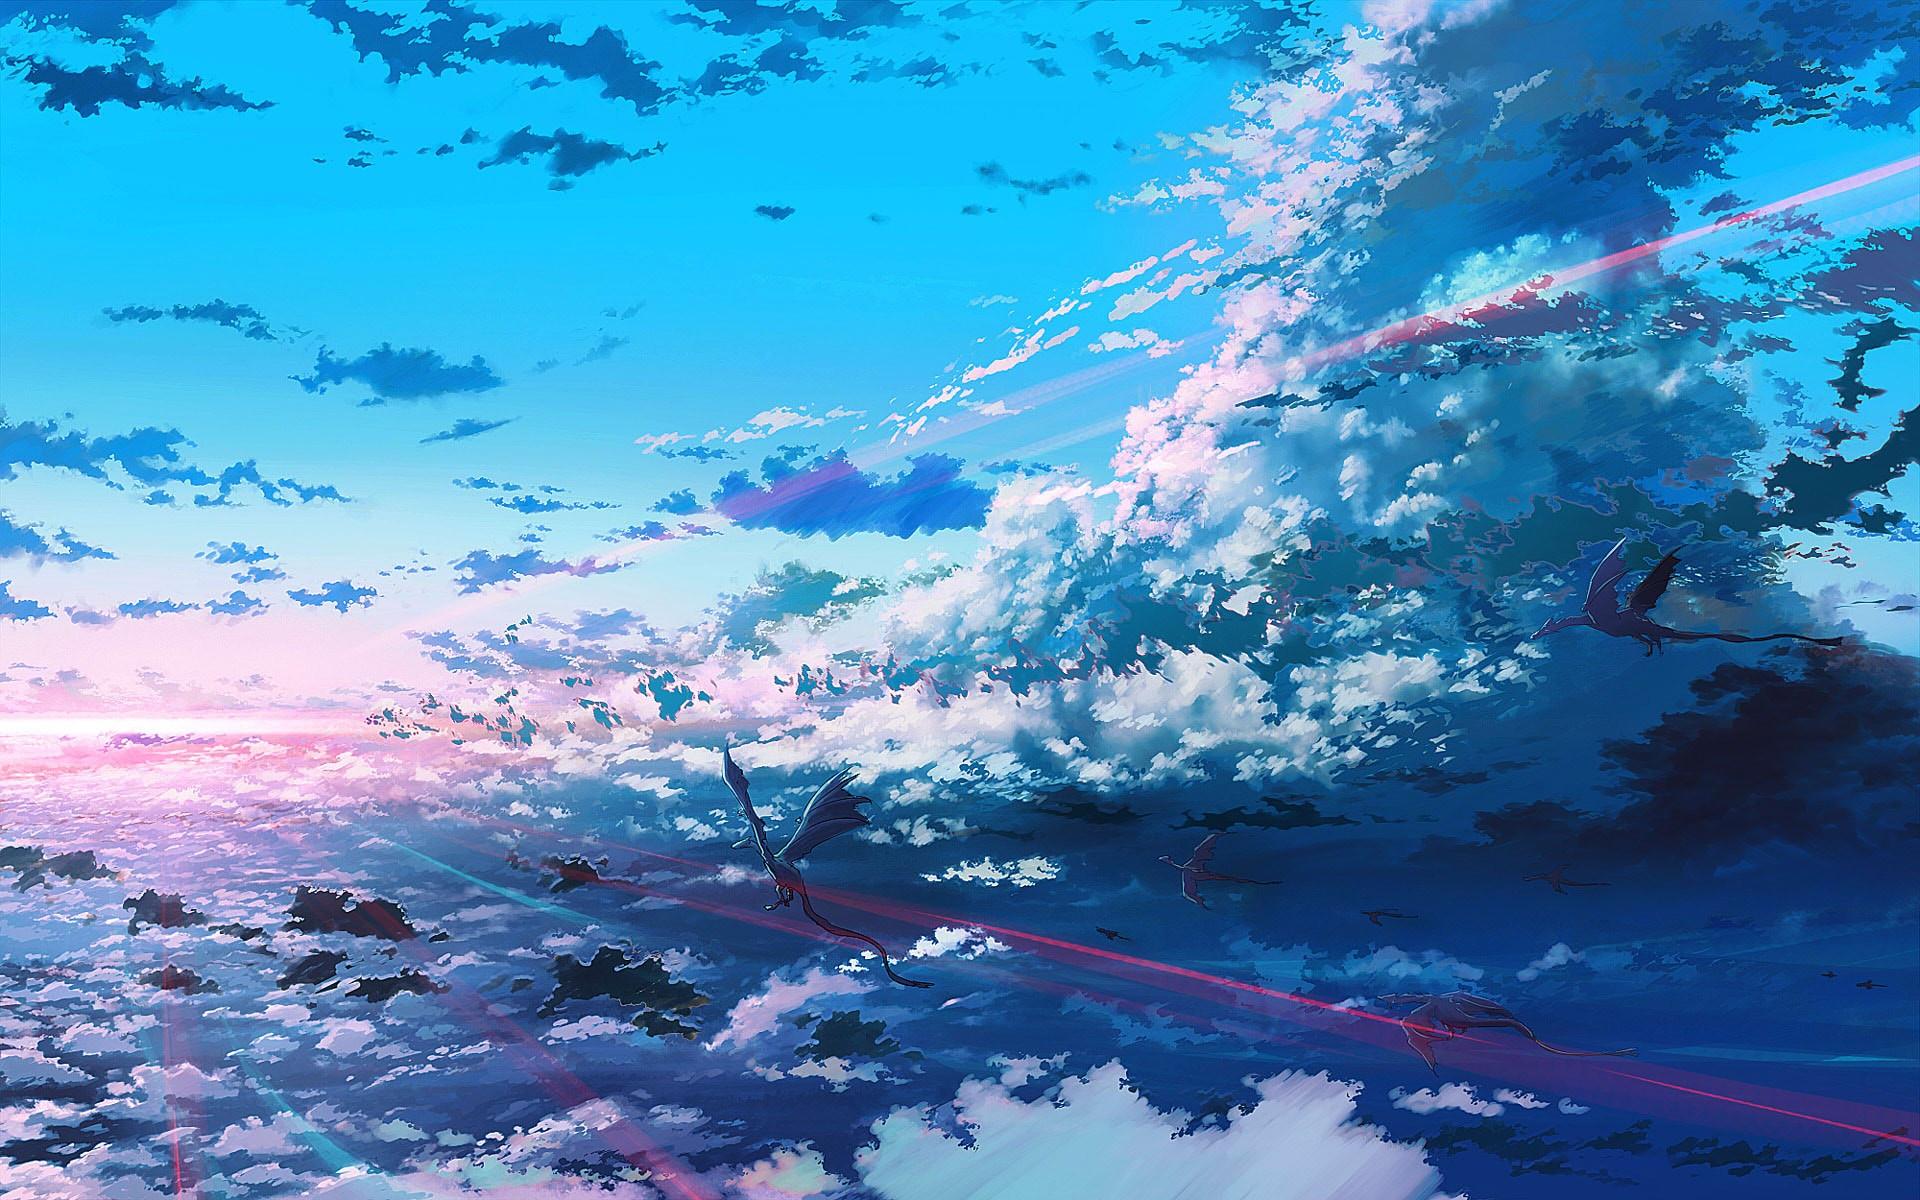 Wallpaper Sunlight Digital Art Fantasy Art Anime Sky Frost